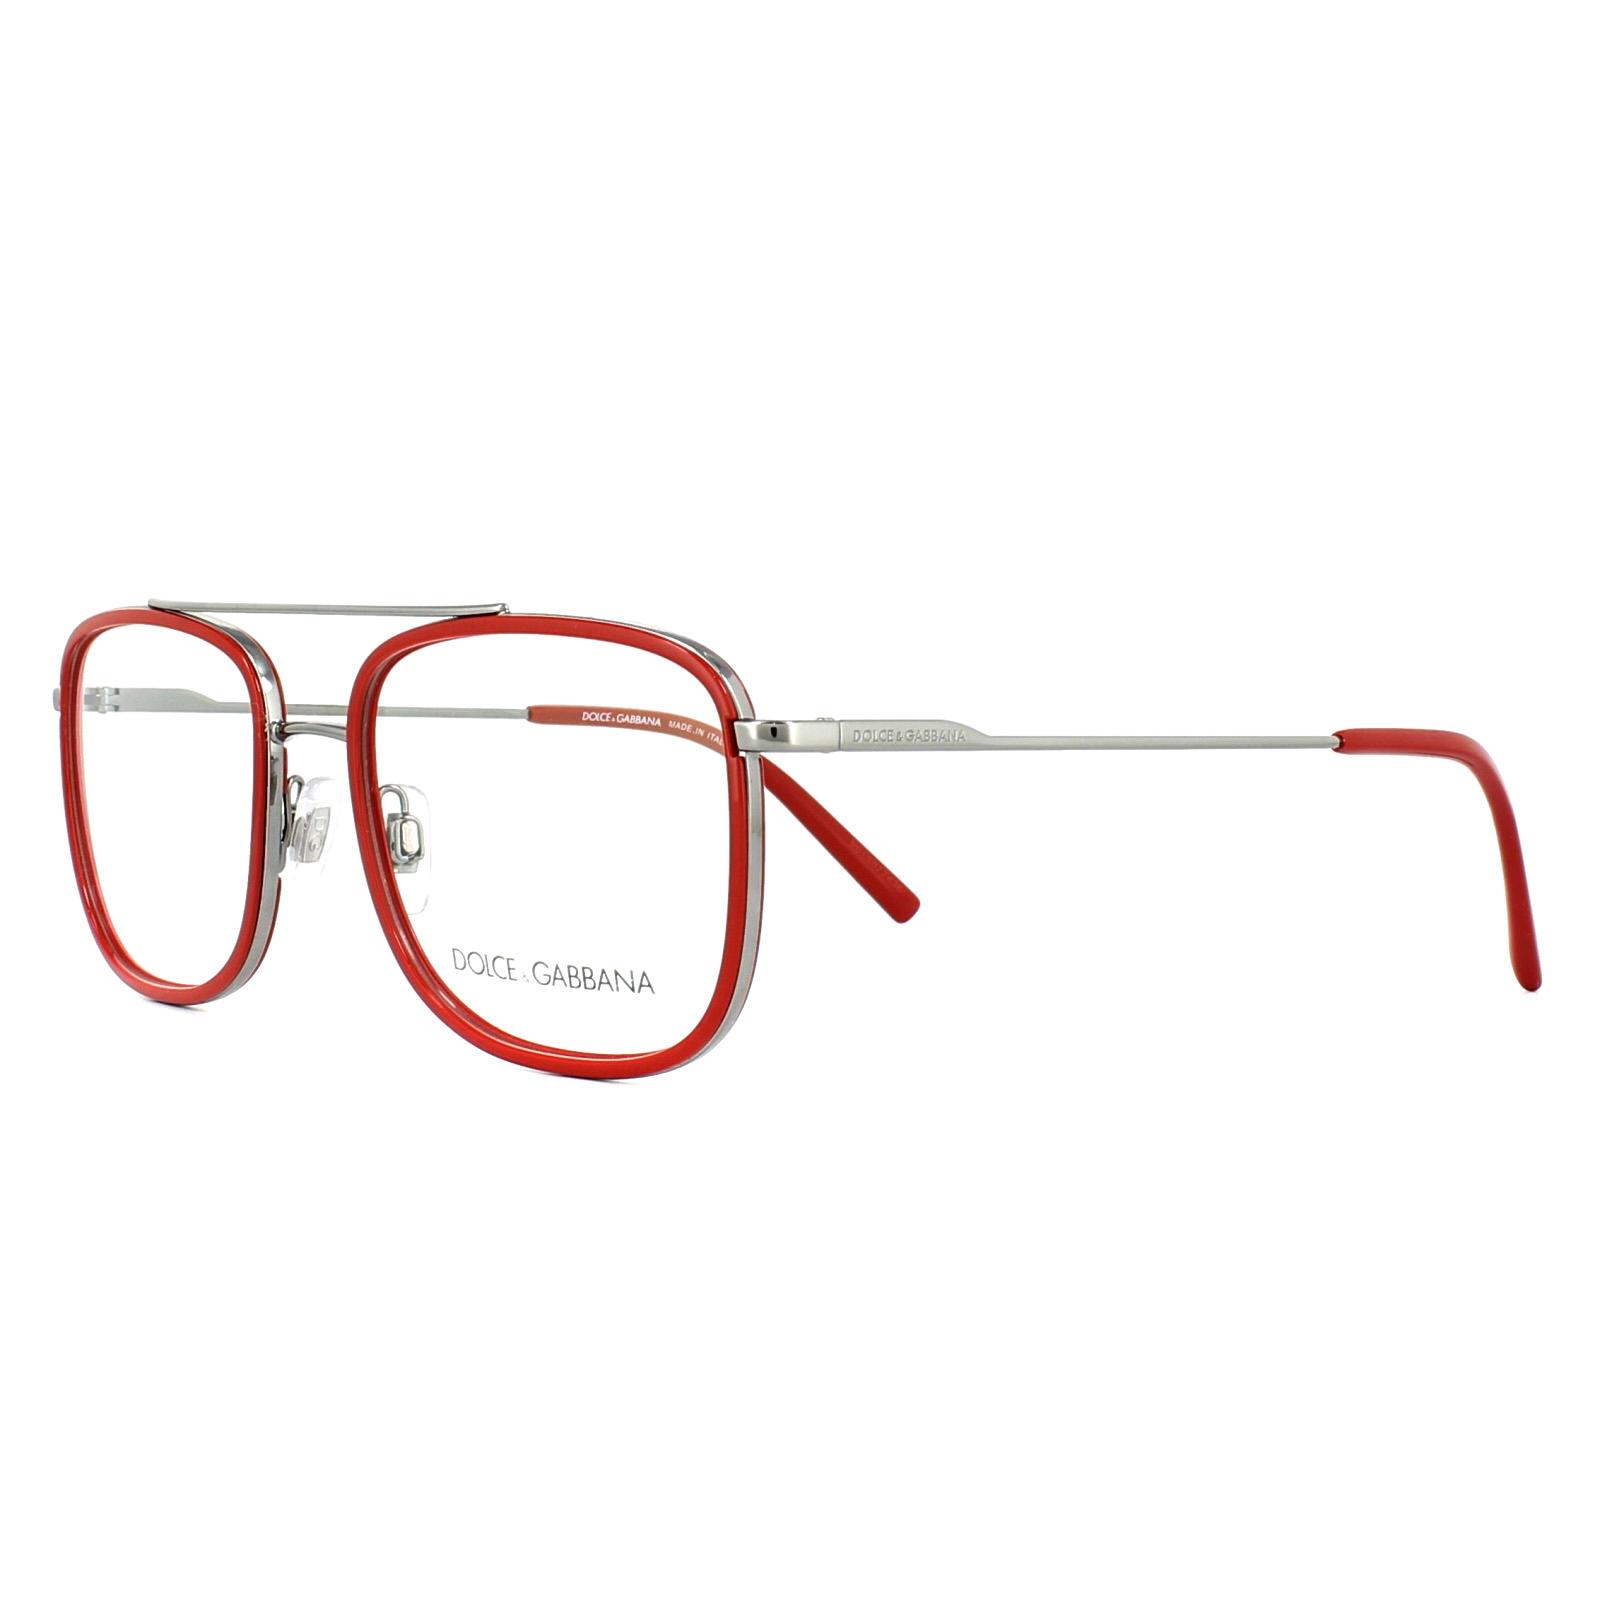 e96575d3d1a4 Sentinel Dolce & Gabbana Glasses Frames DG 1288 04 Gunmetal Red 53mm Mens